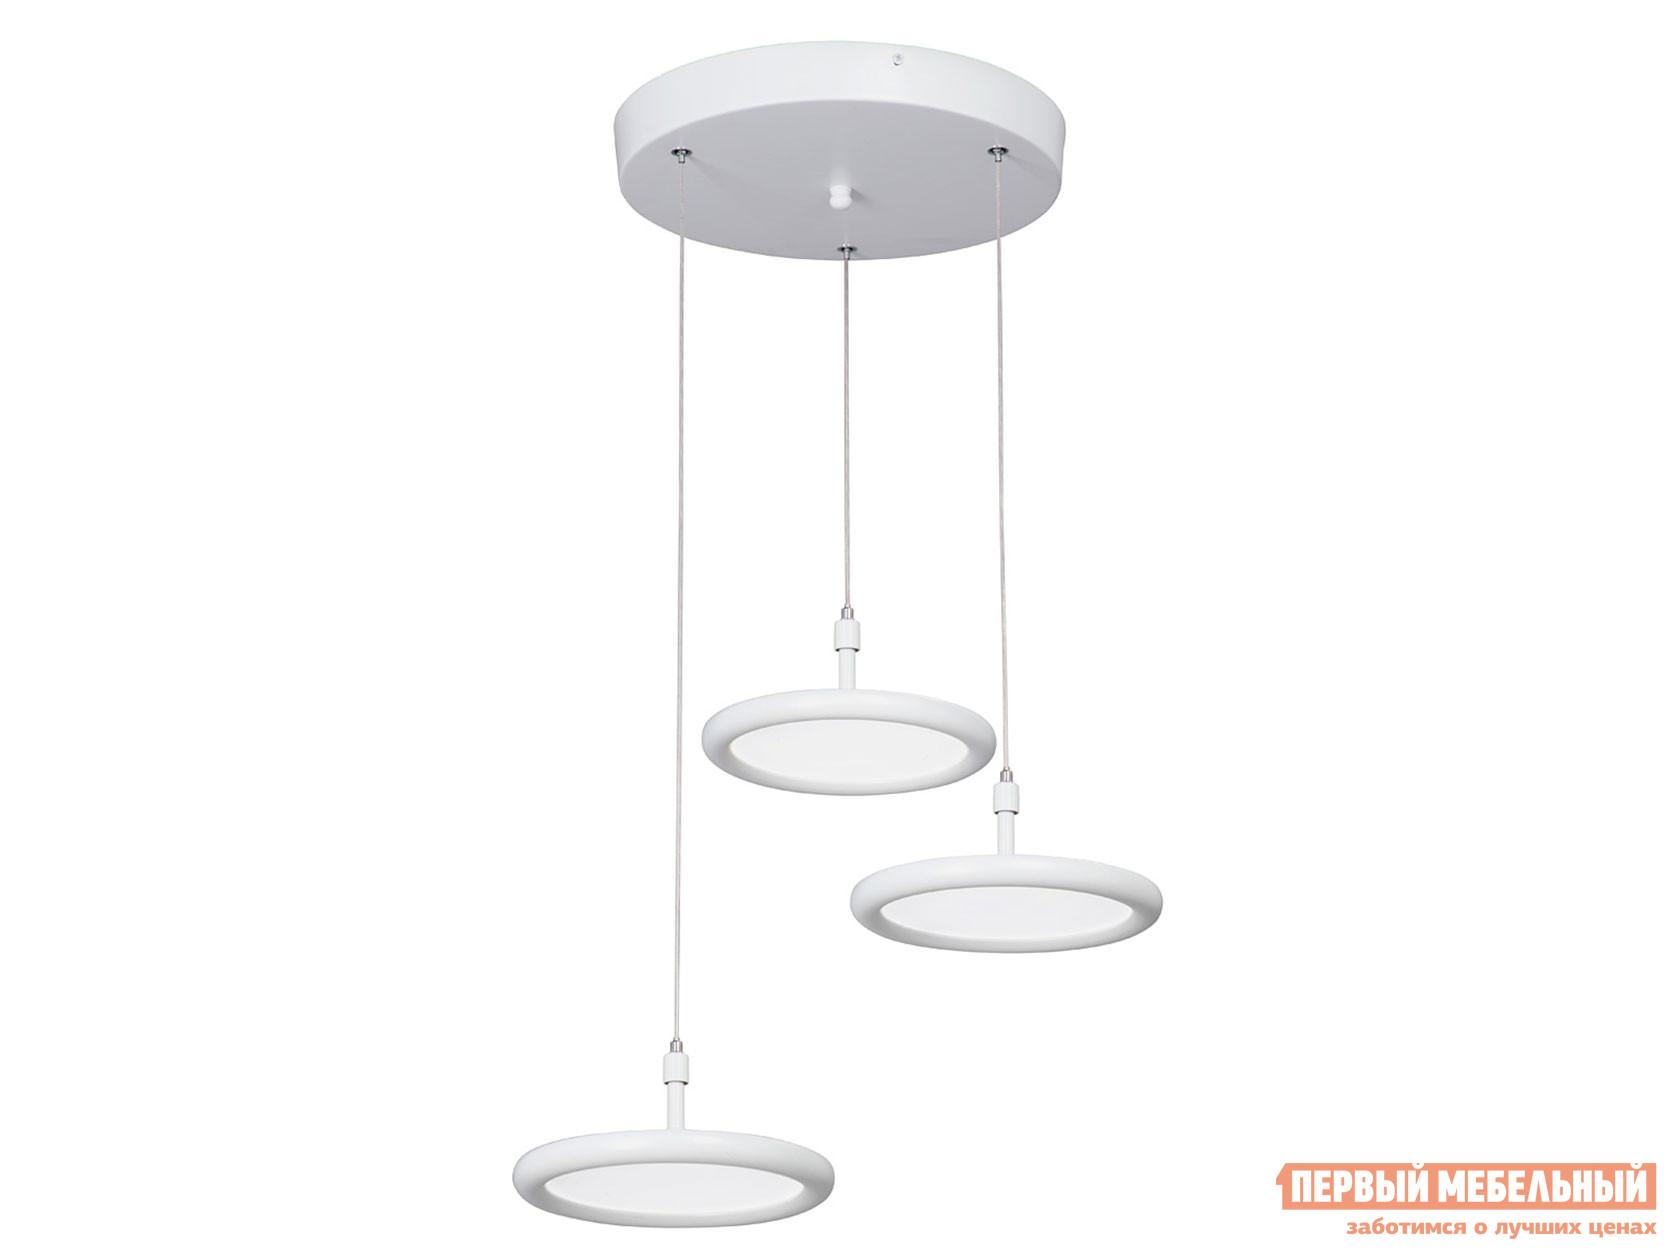 Люстра КСК-электро Светодиодный светильник V4604-0/3S, LED 36Вт, 3900-4200K / Светодиодный светильник V4604-1/3S, LED 36Вт, 3900-4200К